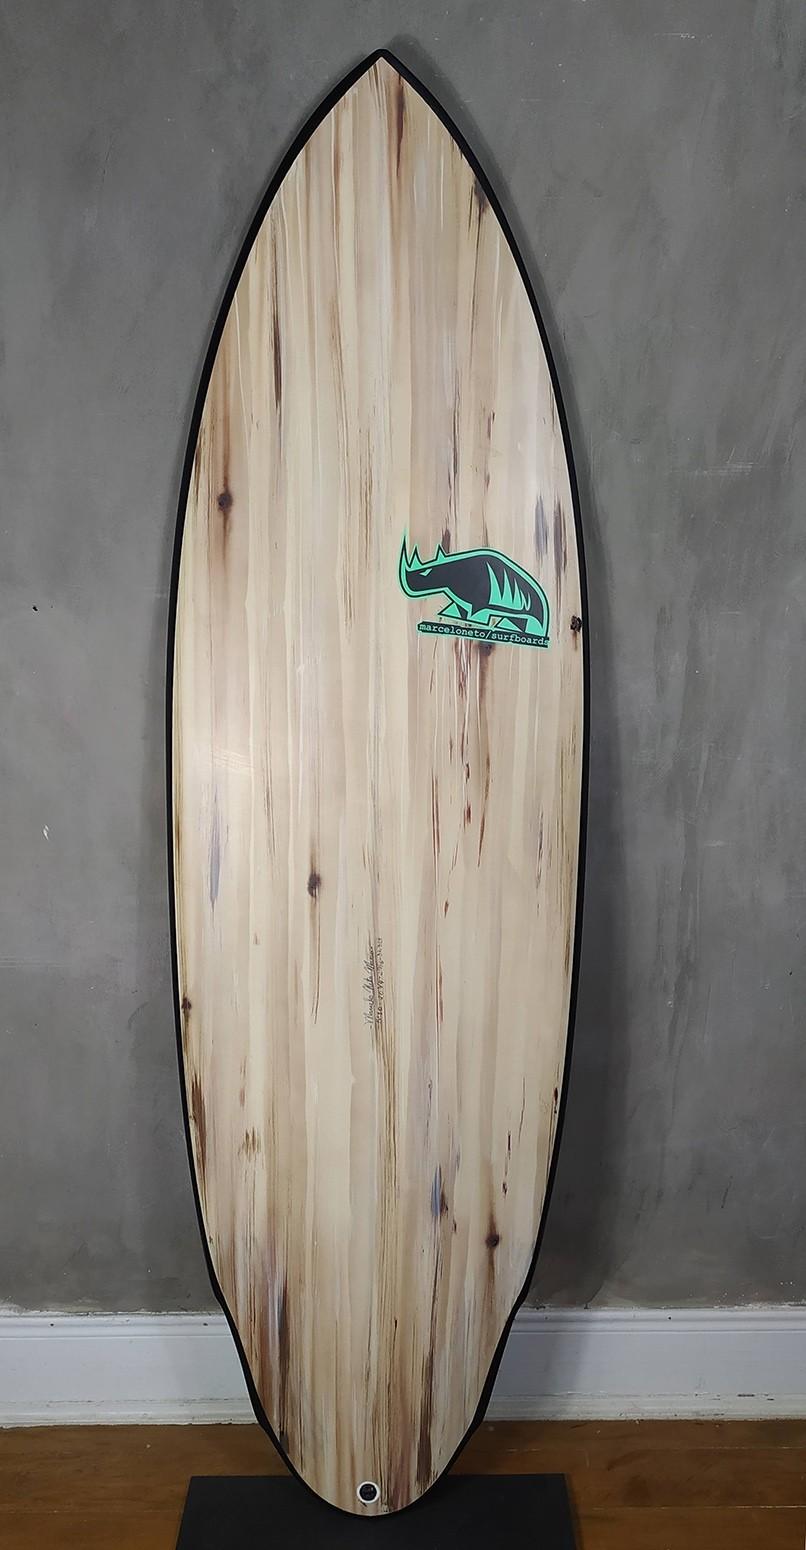 "Prancha de Surf Marcelo Neto 5'10"" Madeira"